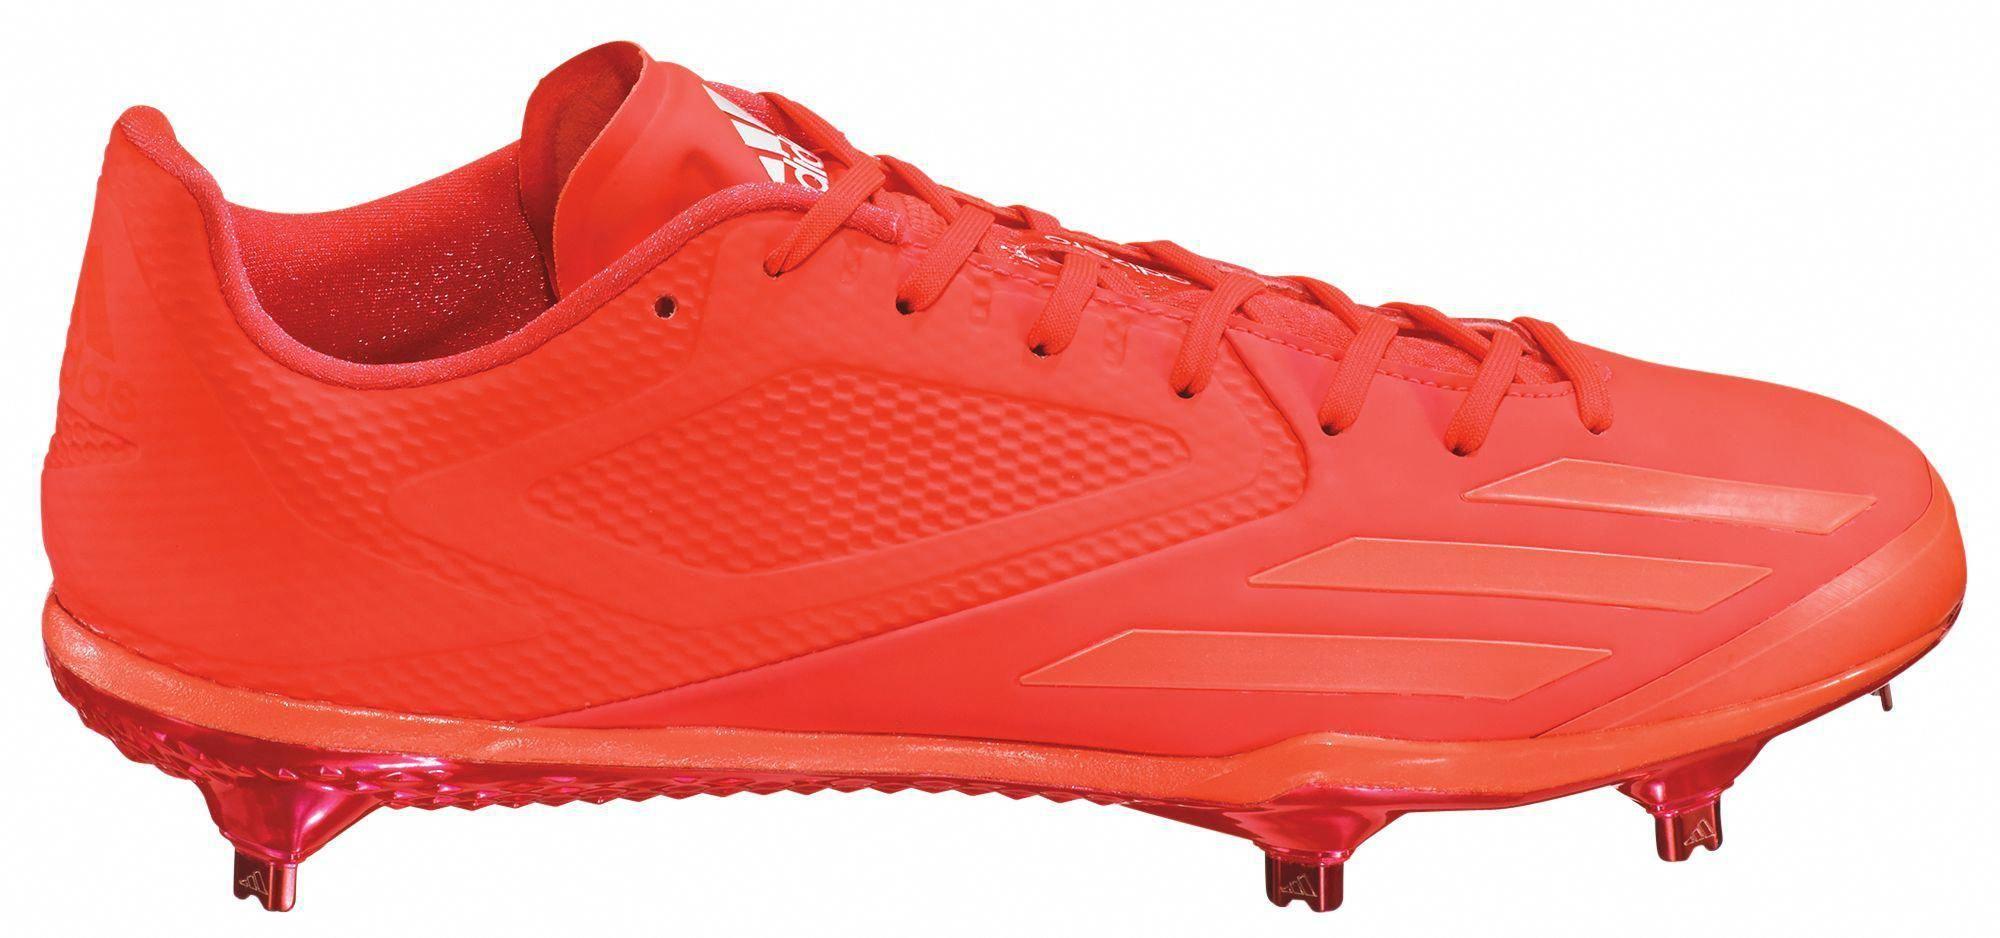 ccdd66a42832 adidas Men's adizero Afterburner 3 E Metal Baseball Cleats, Infrared # baseballcleats #baseballbases